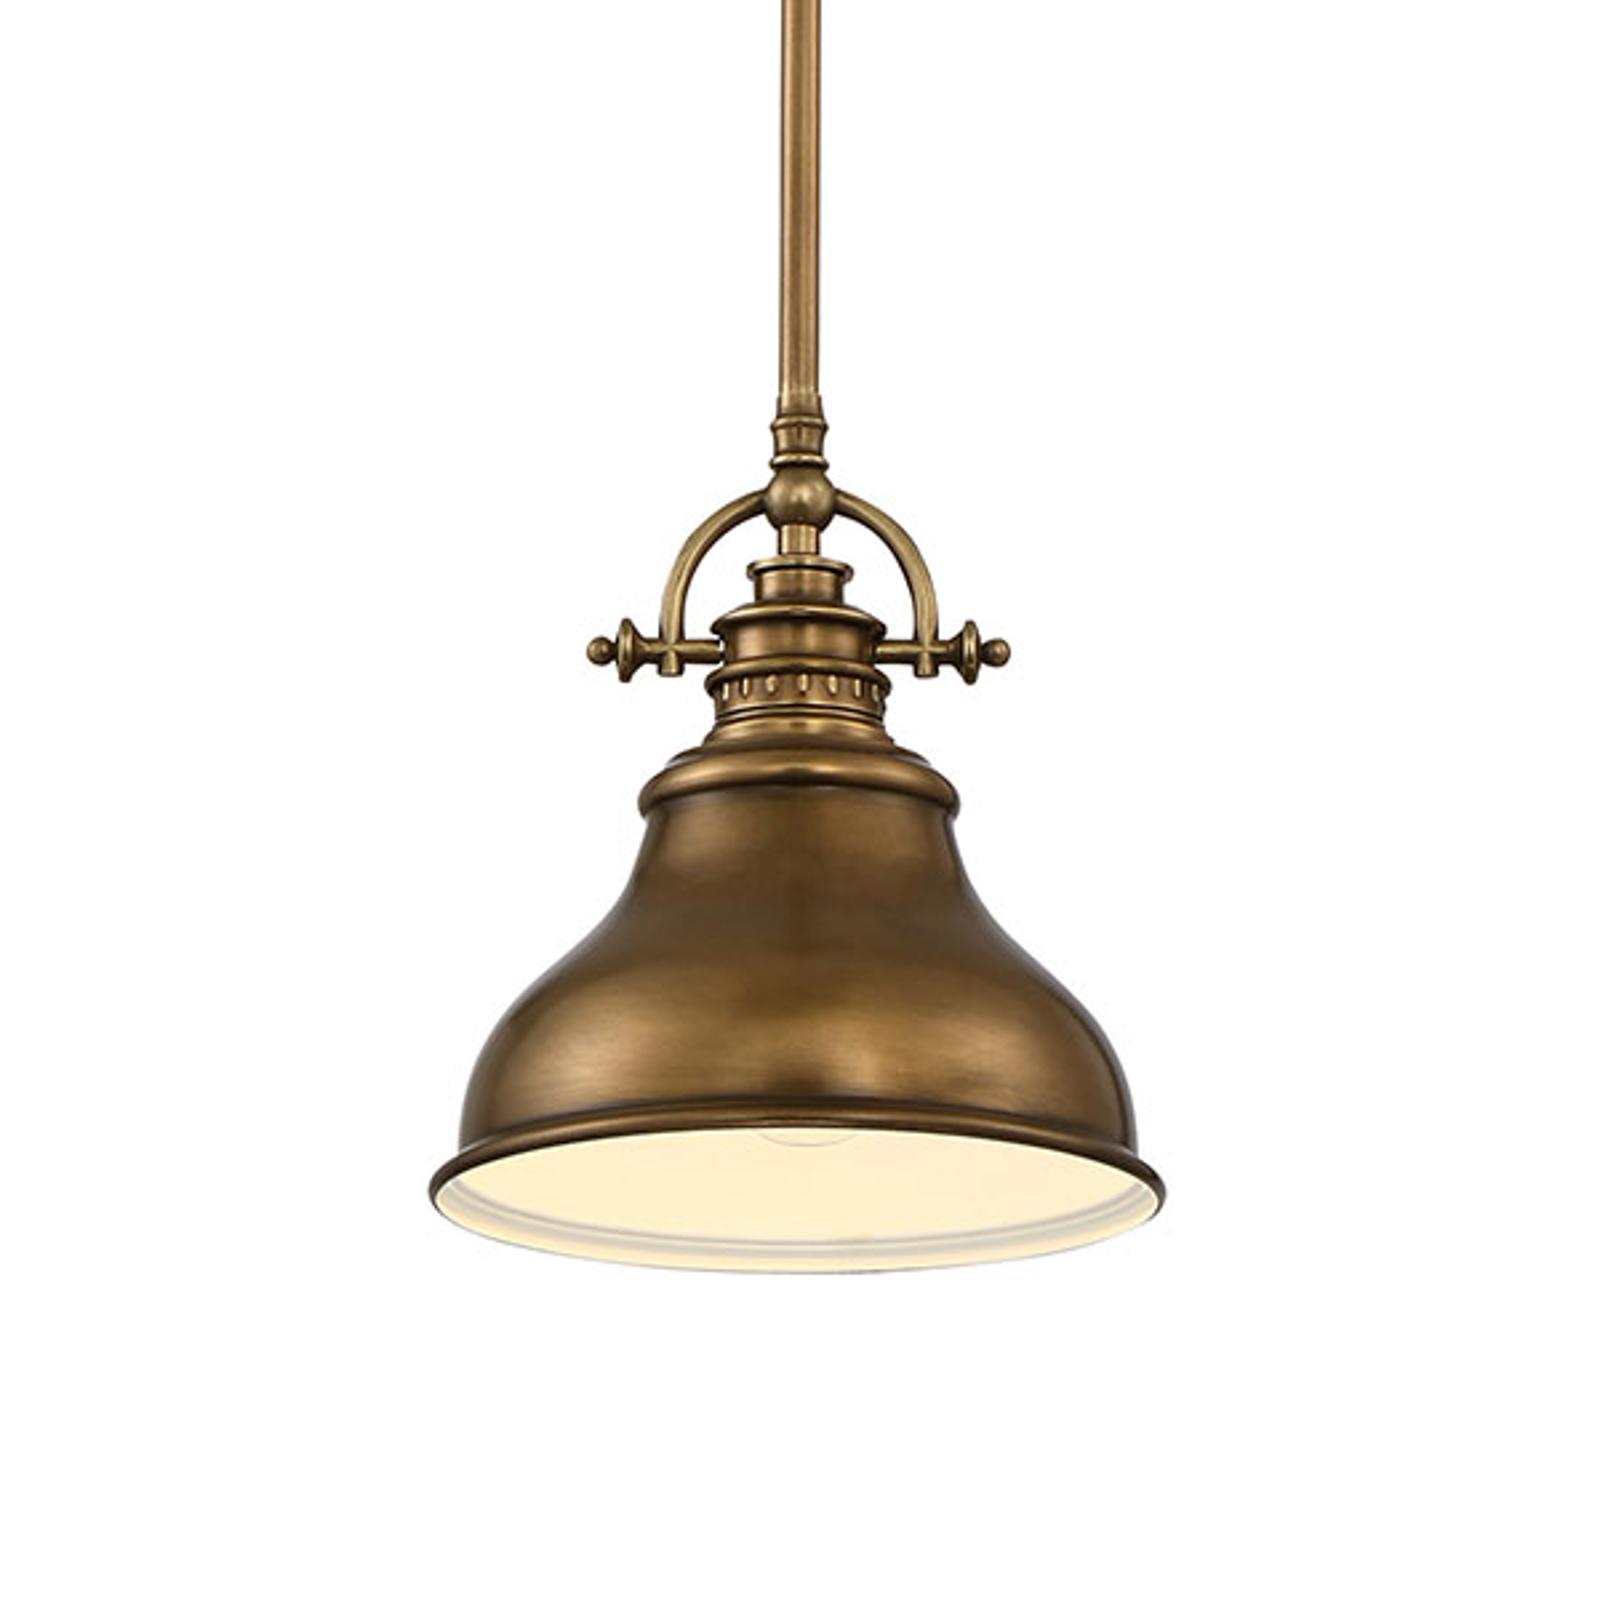 Hanglamp Emery 1-lamp messing Ø 20,3 cm